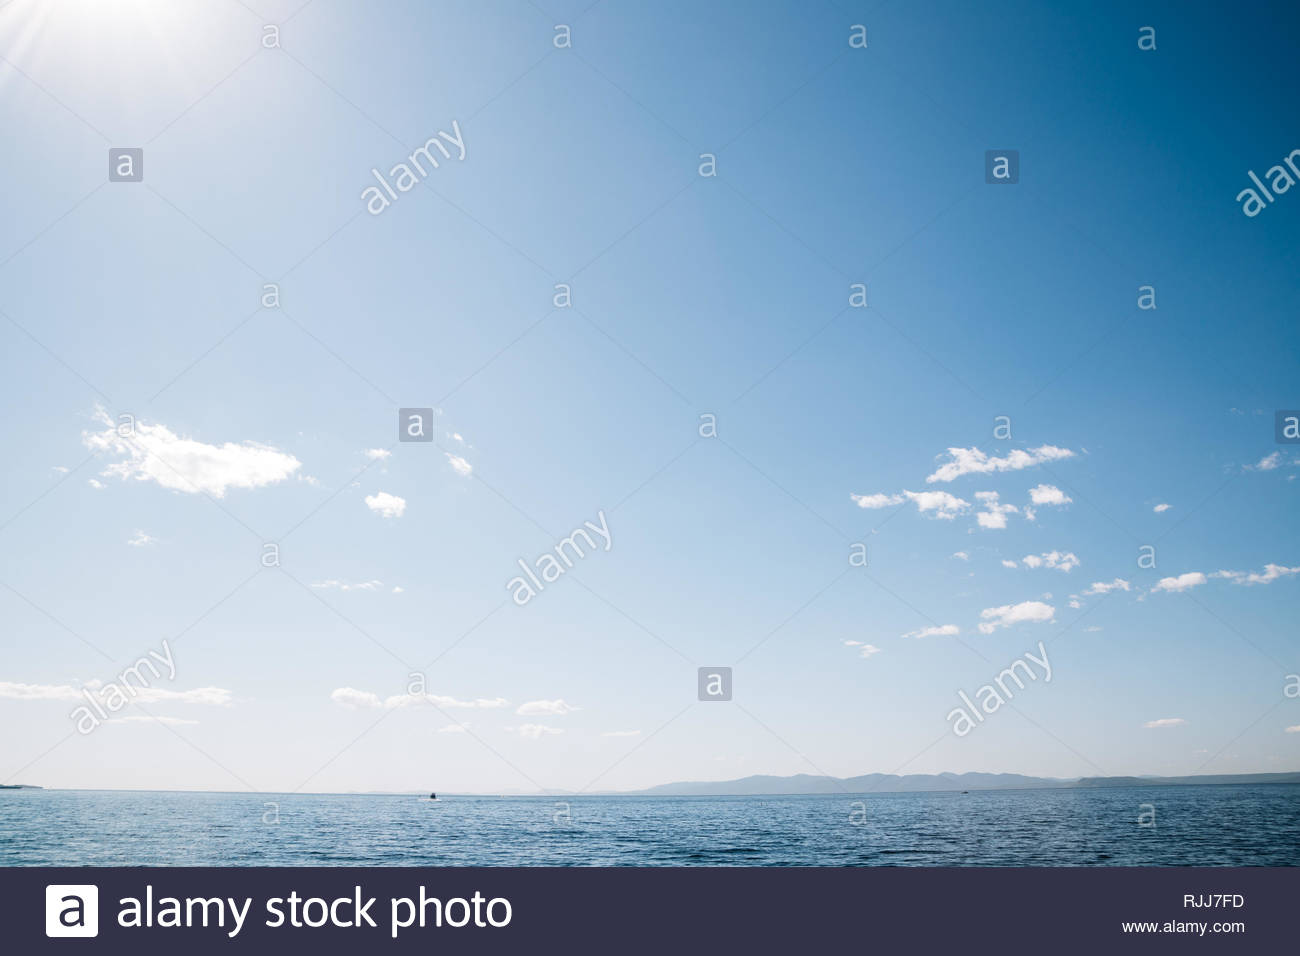 Blue sea and sky in Vladivostok, Russia - Stock Image